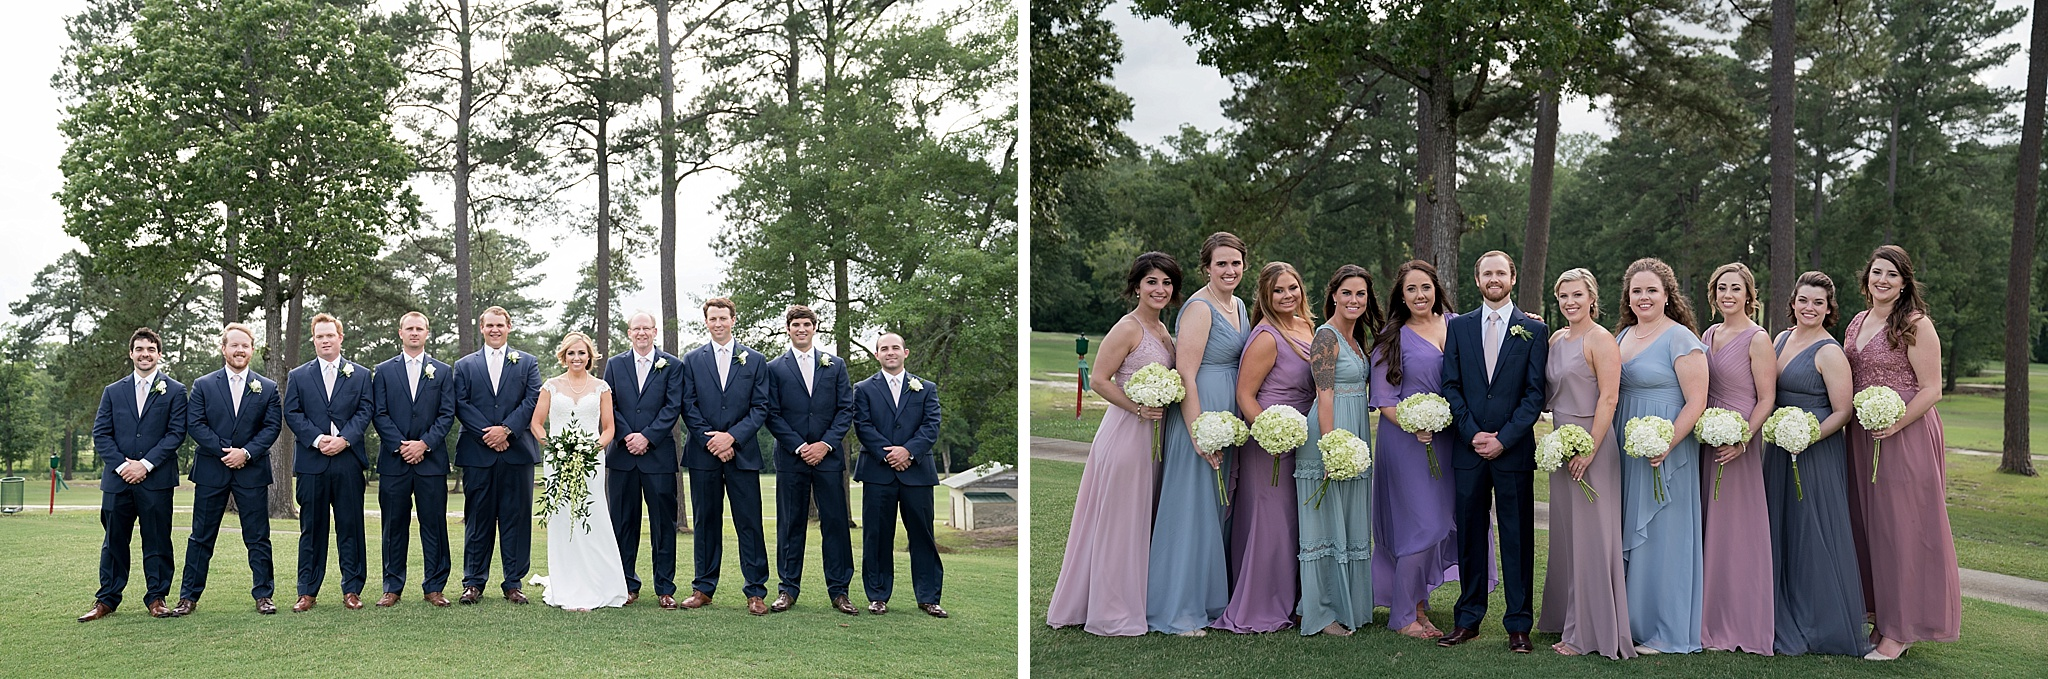 Williamston-NC-Wedding-Photographer-026.jpg